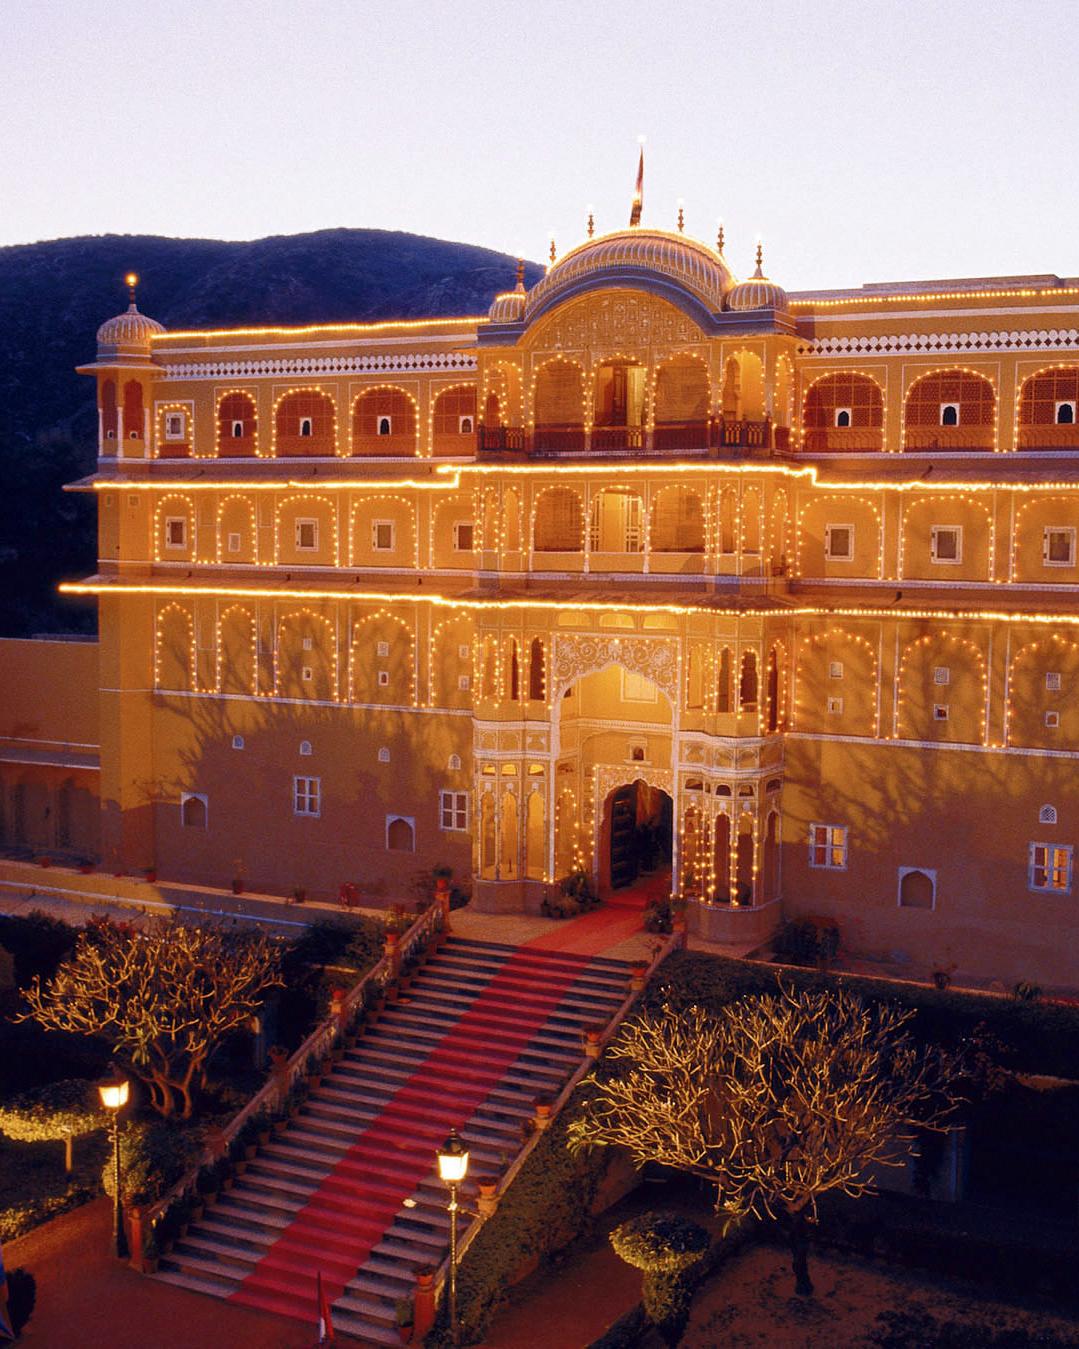 mr-mrs-smith-travel-hotels-wd0413-samode-palace-3.jpg